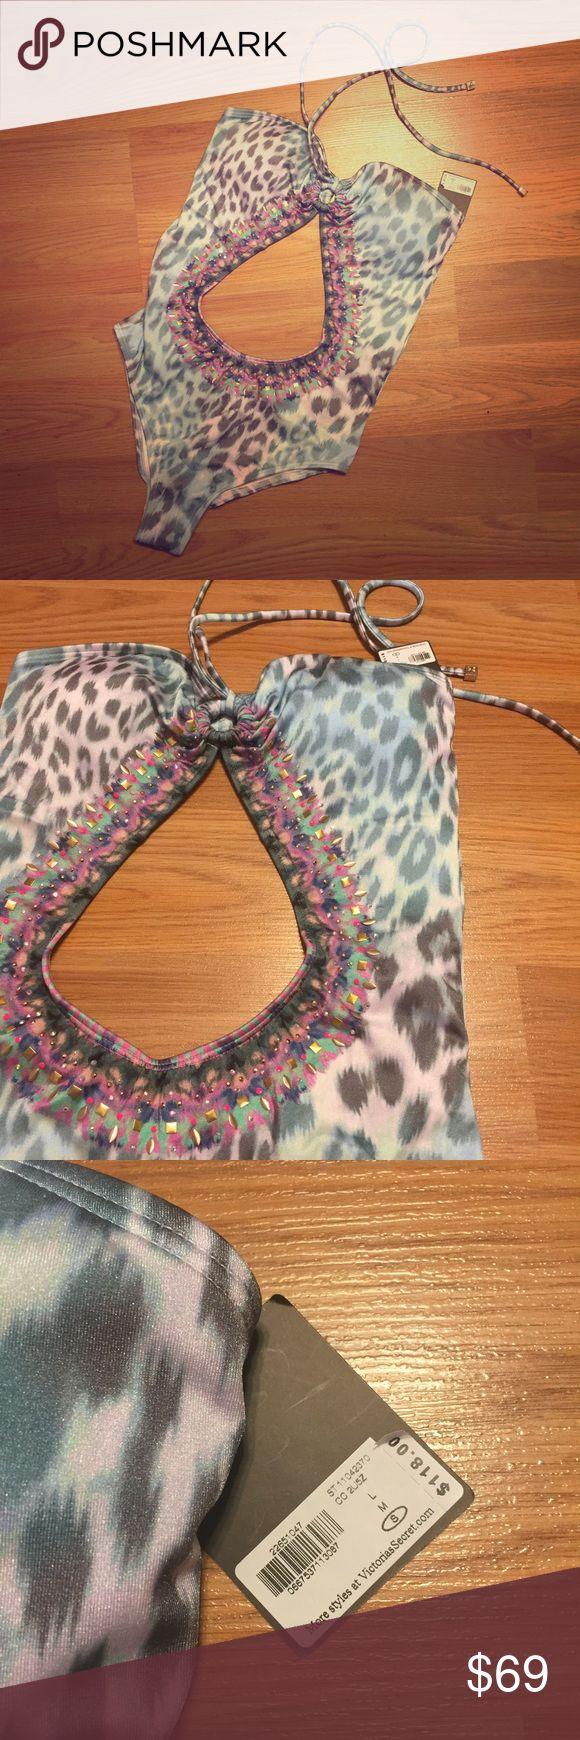 Victoria's Secret Swim Jeweled Monokini. Uniquely designed jeweled one piece swimsuit from Victoria's Secret Swim collection. Victoria's Secret Swim One Pieces